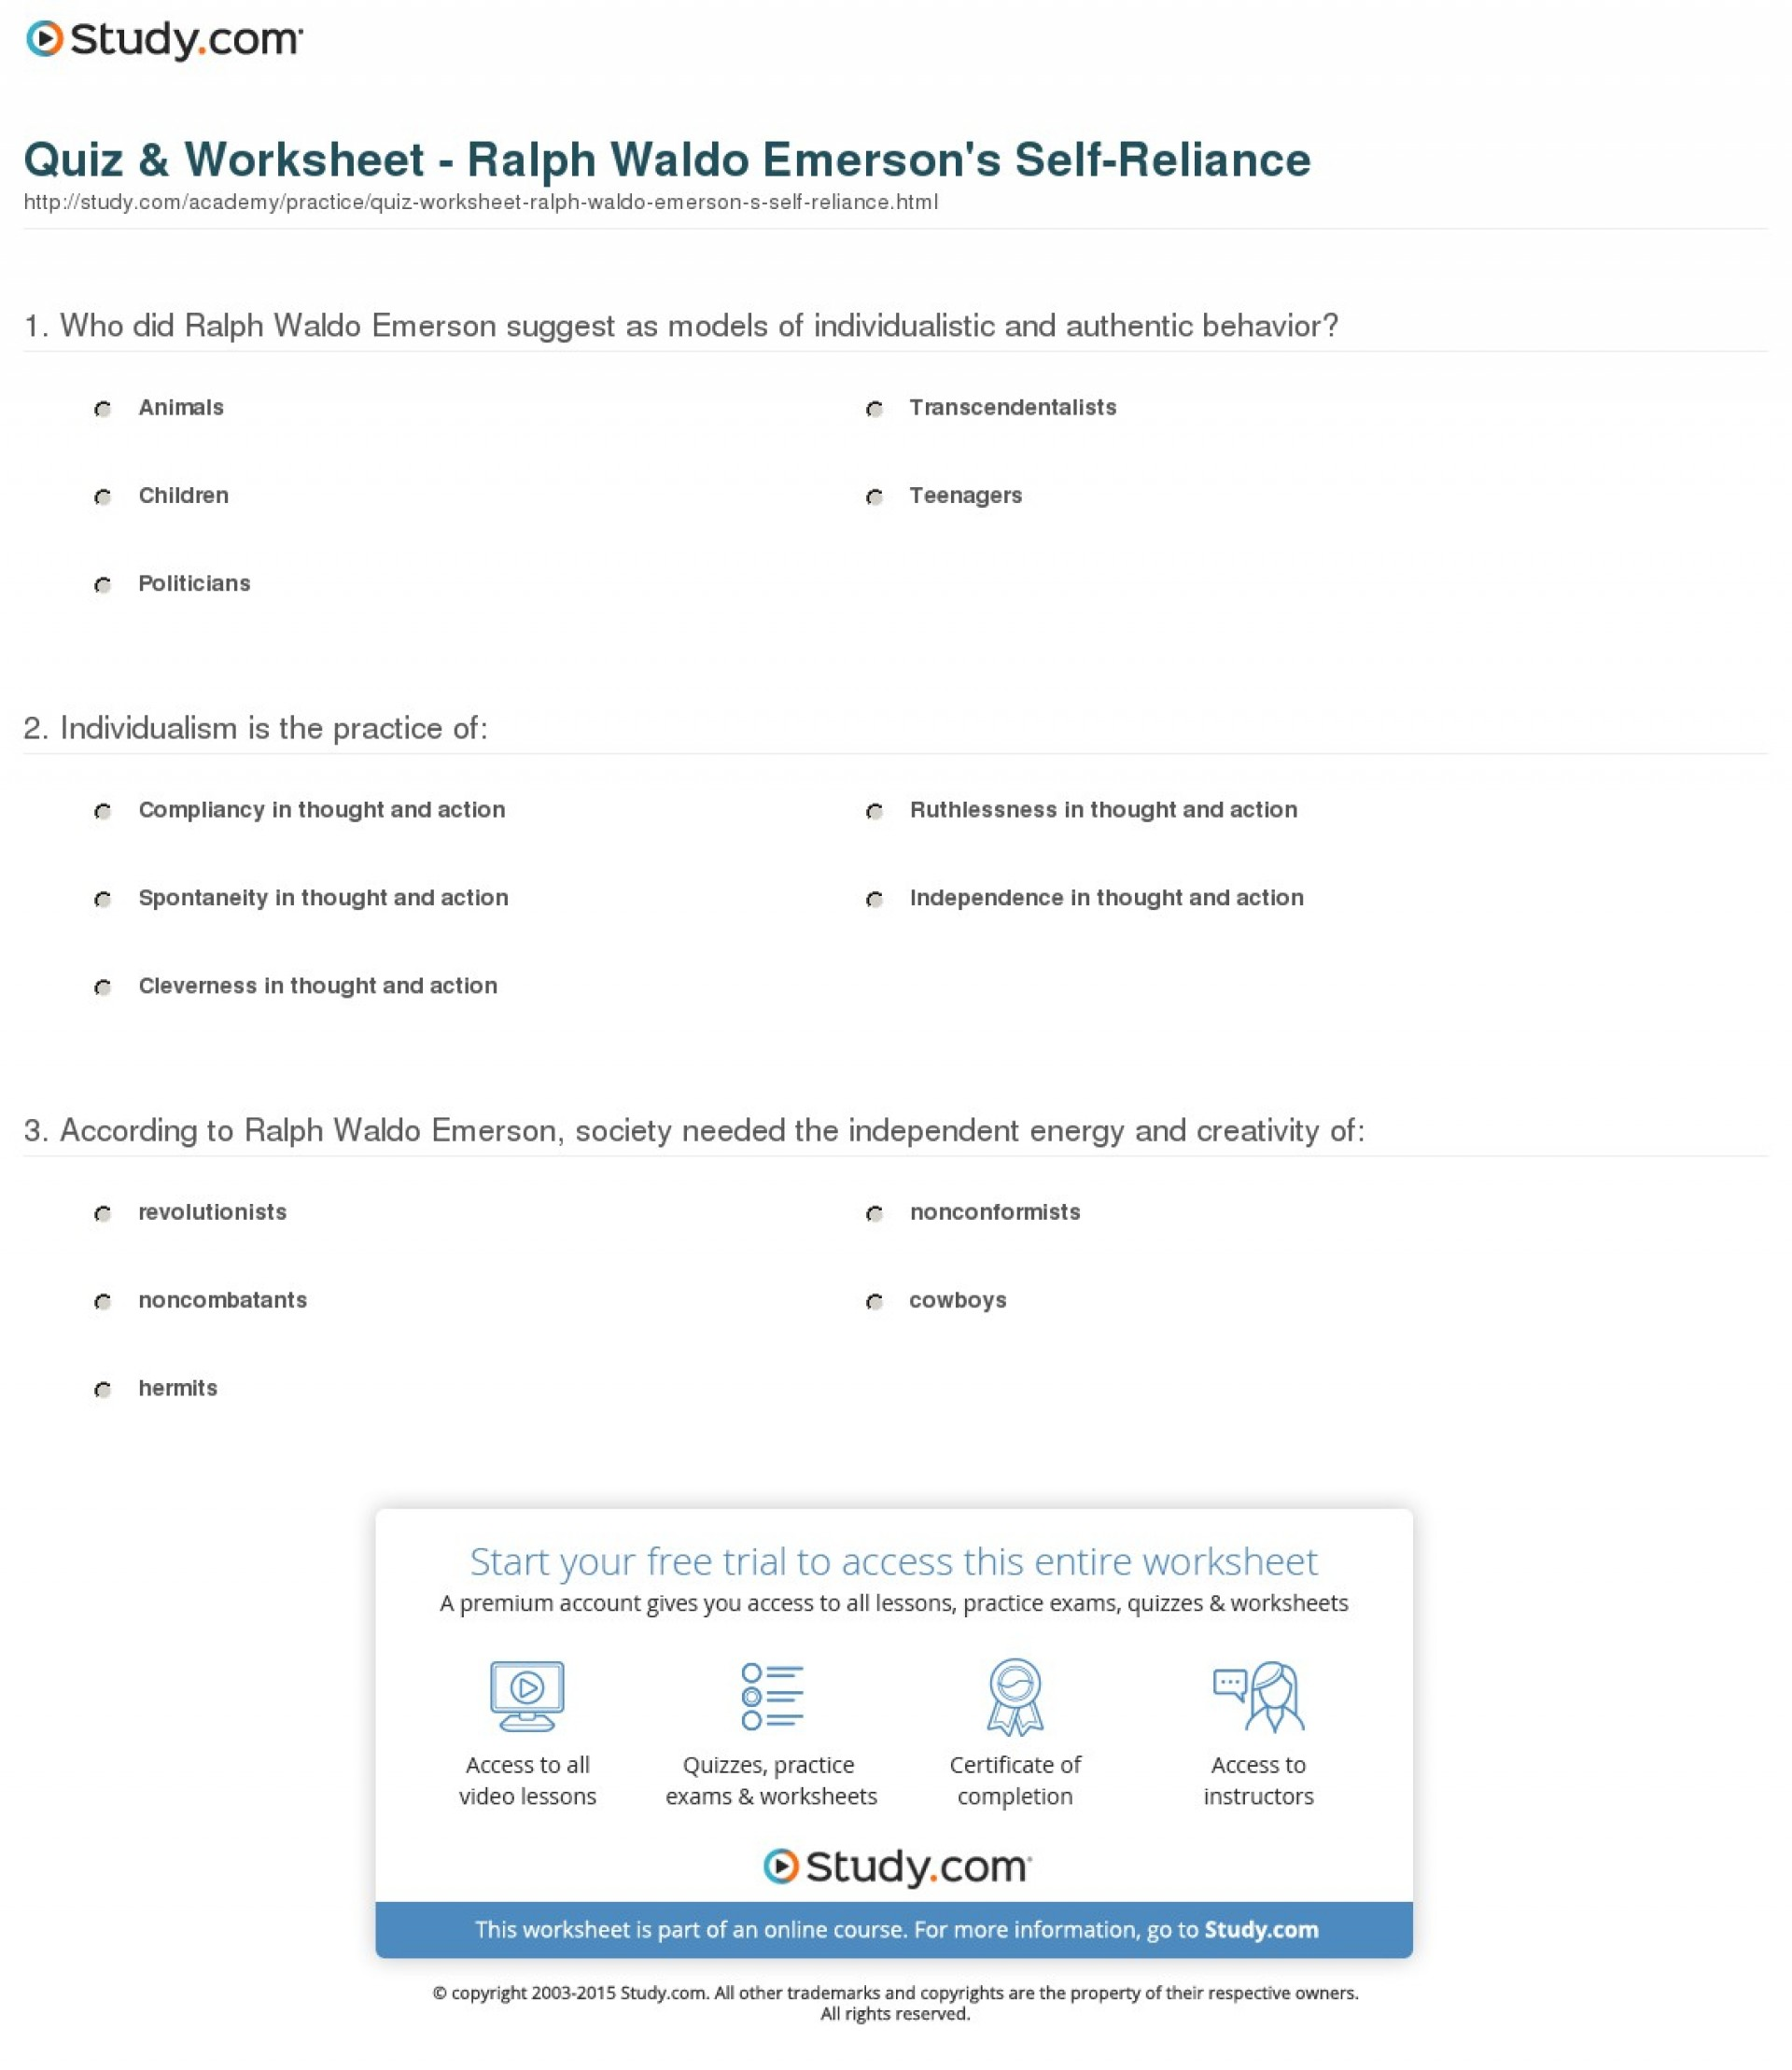 013 Emerson Self Reliance Essay Quiz Worksheet Ralph Waldo